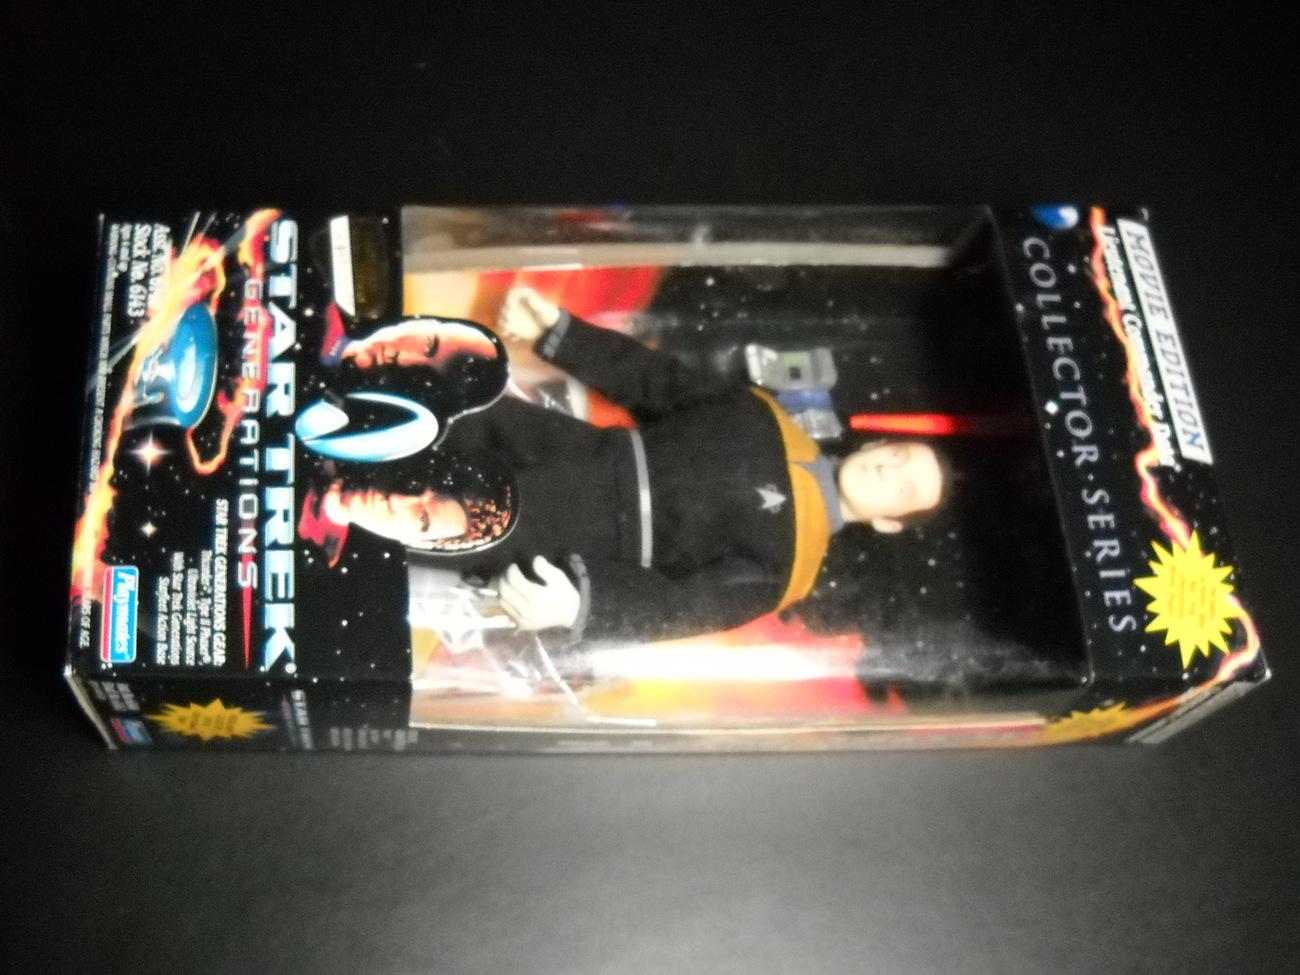 Toy star trek playmates star trek generations movie edition lt commander data 1994 9 inch boxed sealed 01